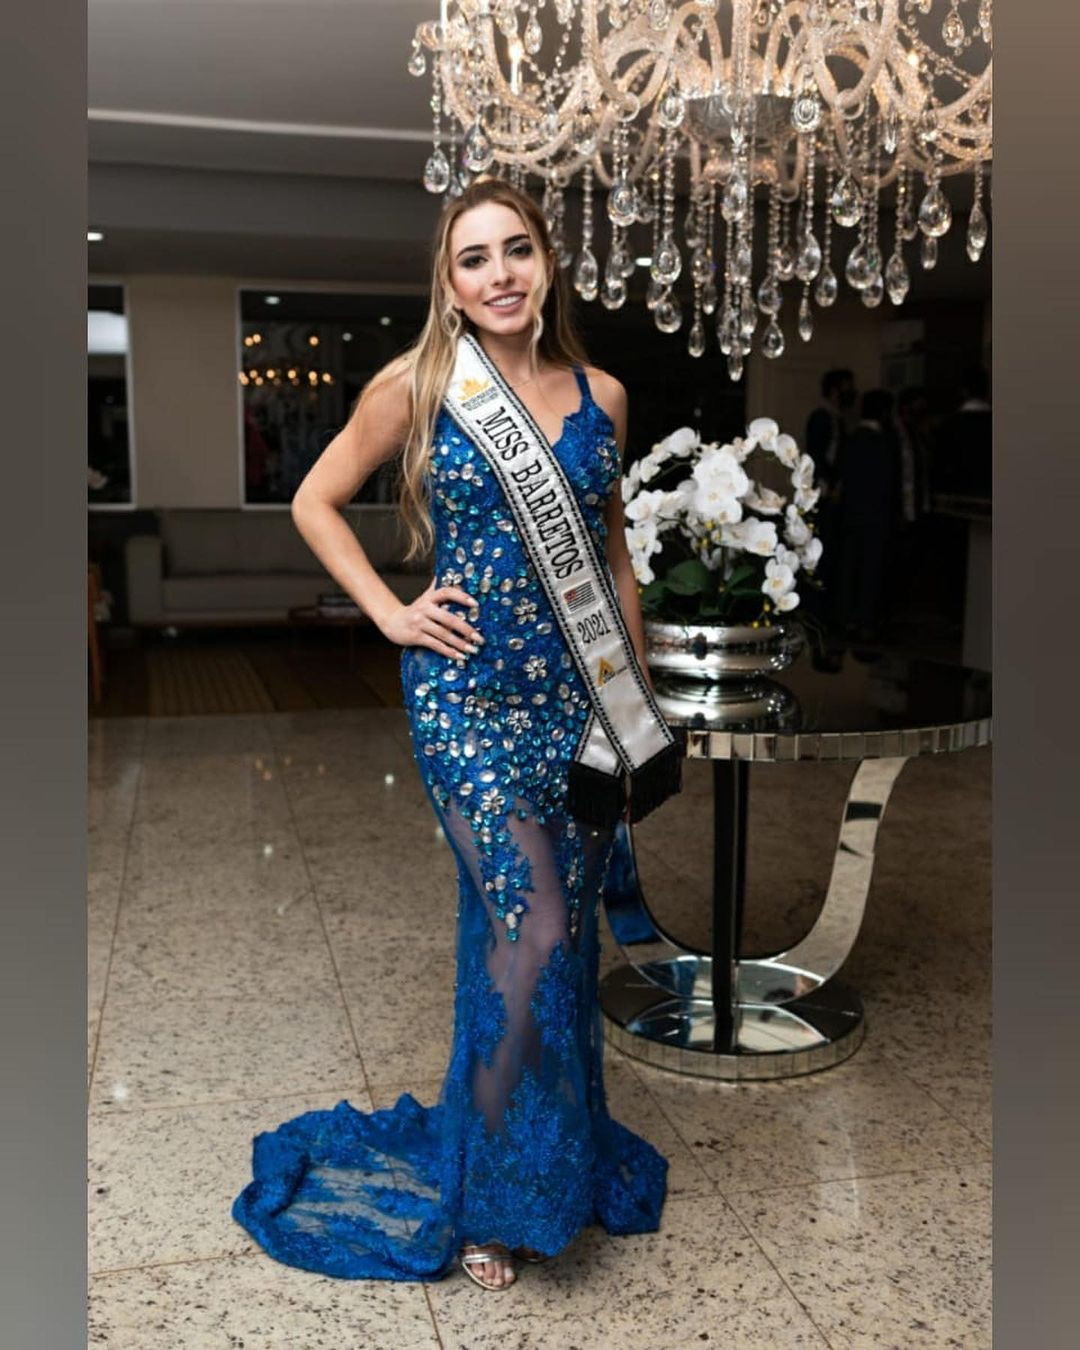 candidatas a miss sao paulo mundo 2022. BZpkx4